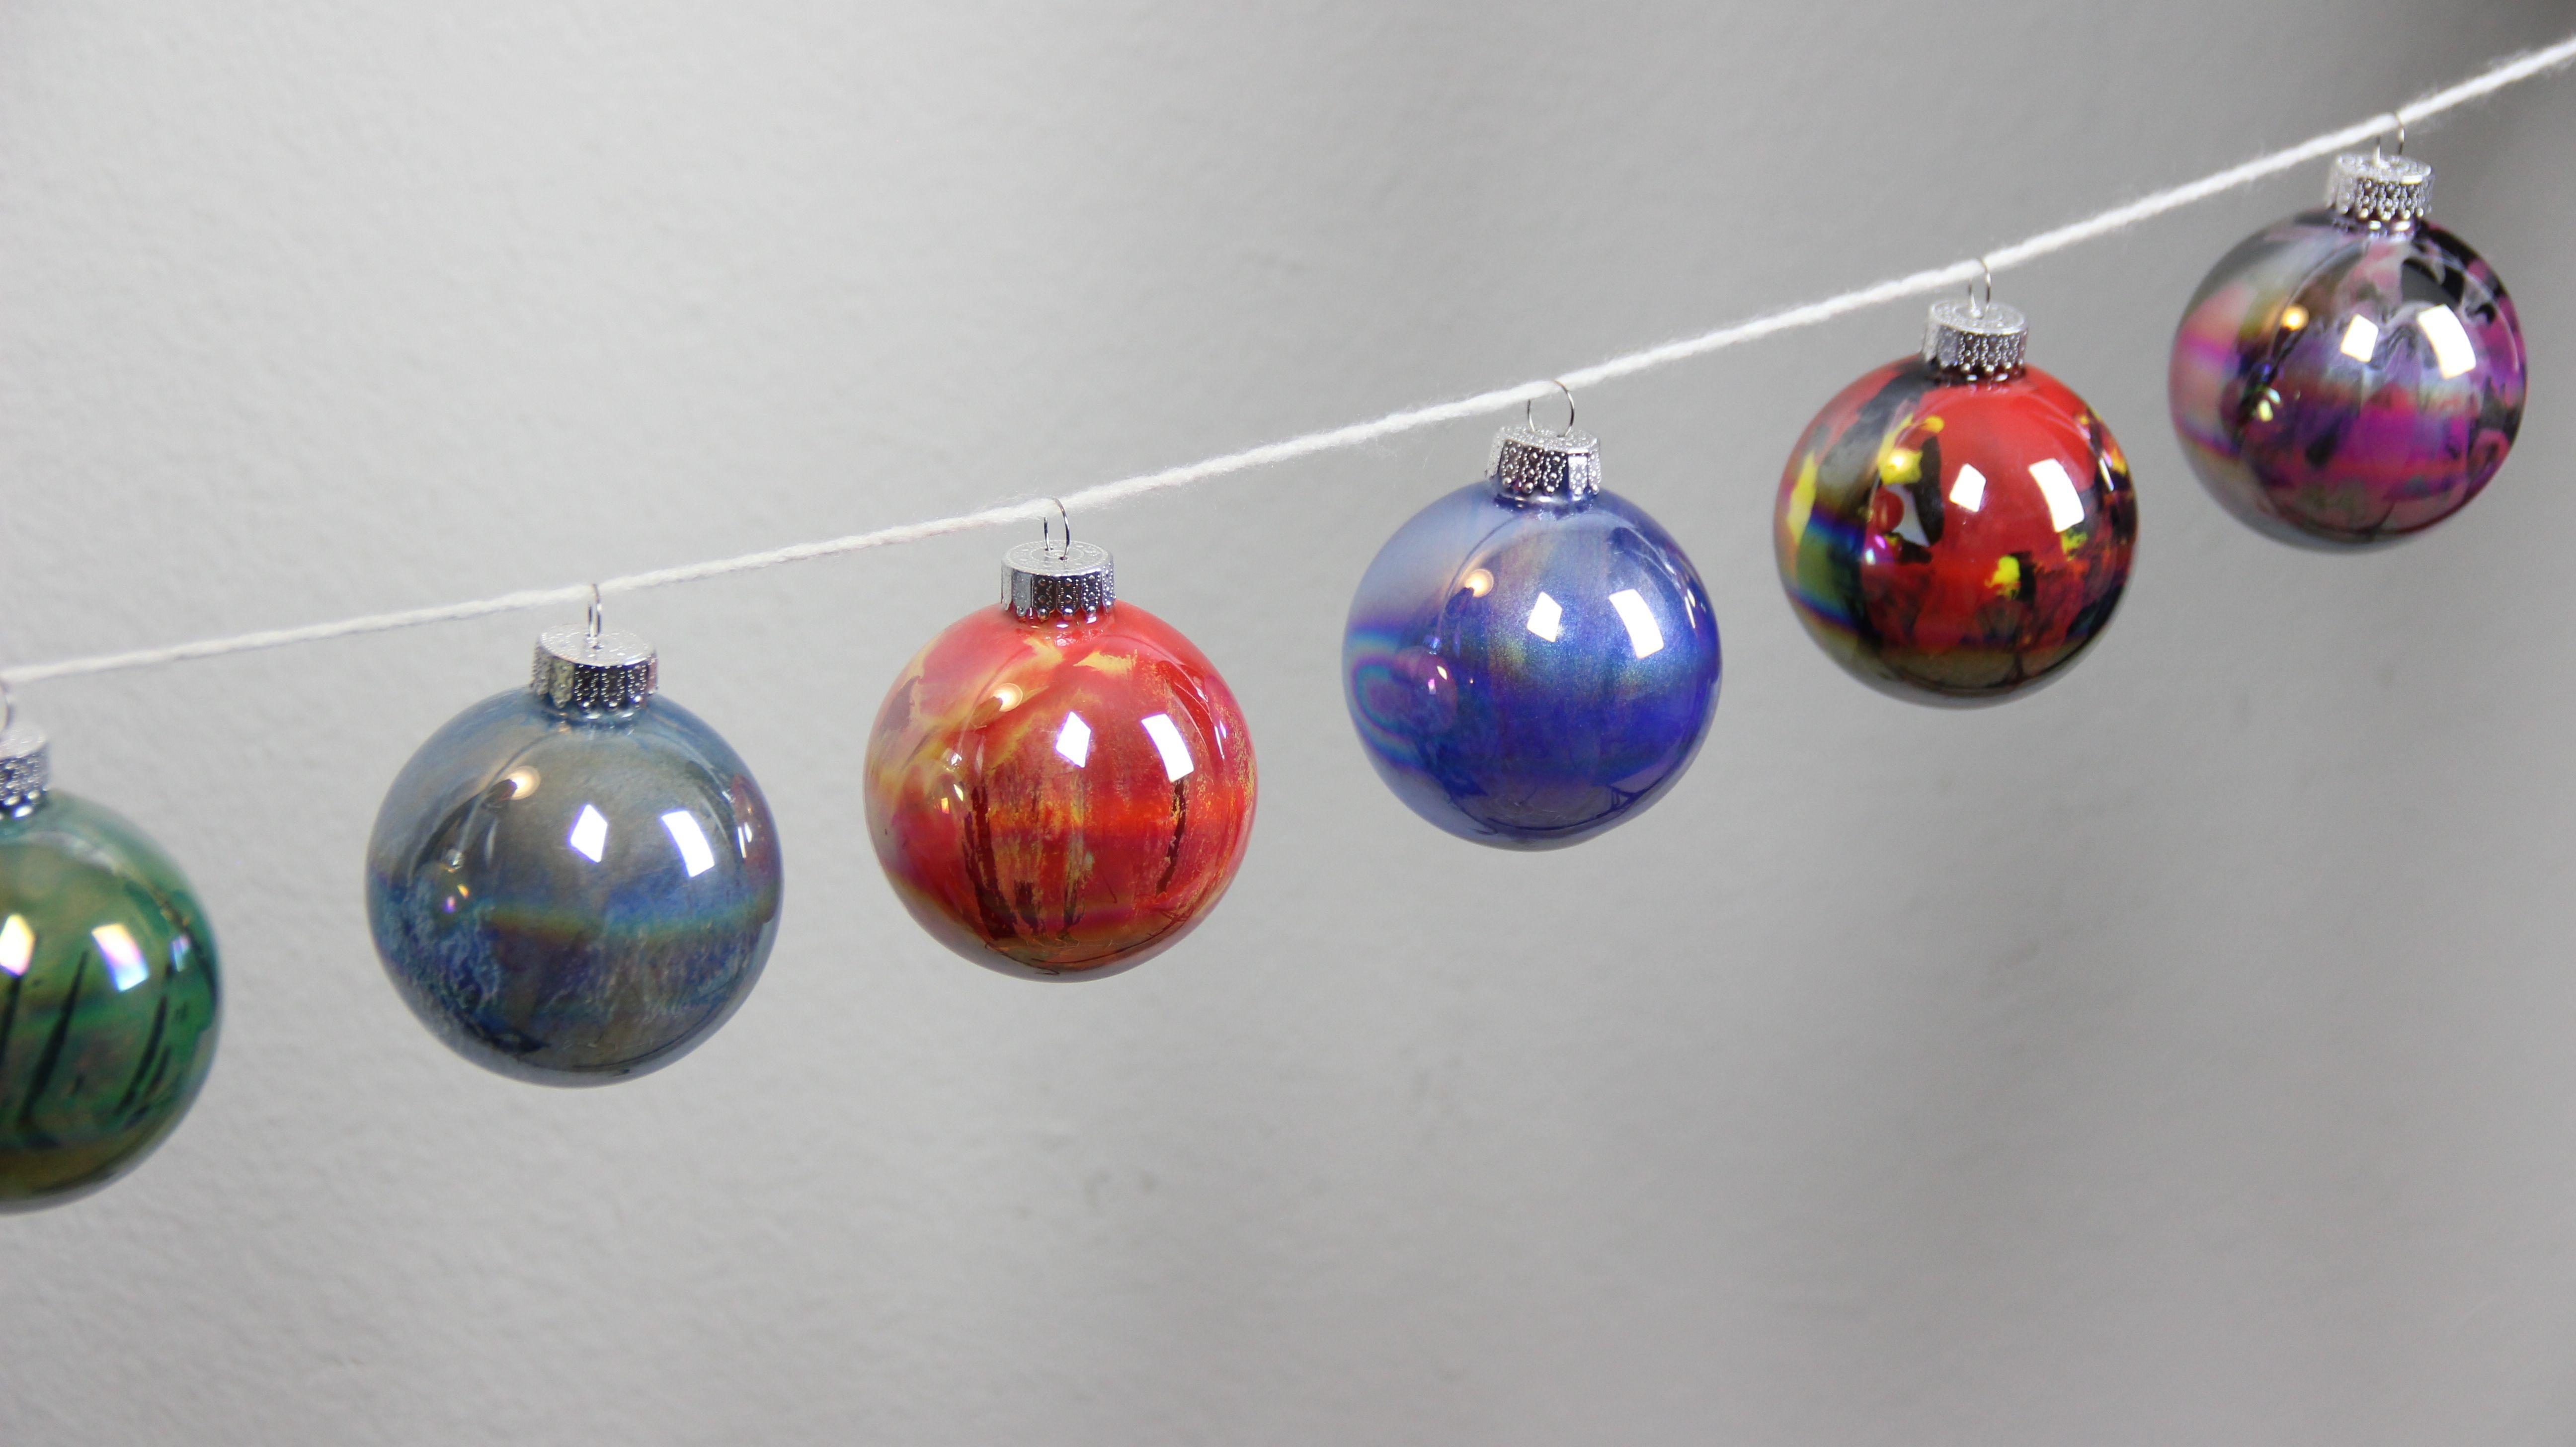 Diy paint swirl ornaments video httpyoutuskkmdkbd10m blog diy paint swirl ornaments video httpyoutu solutioingenieria Gallery